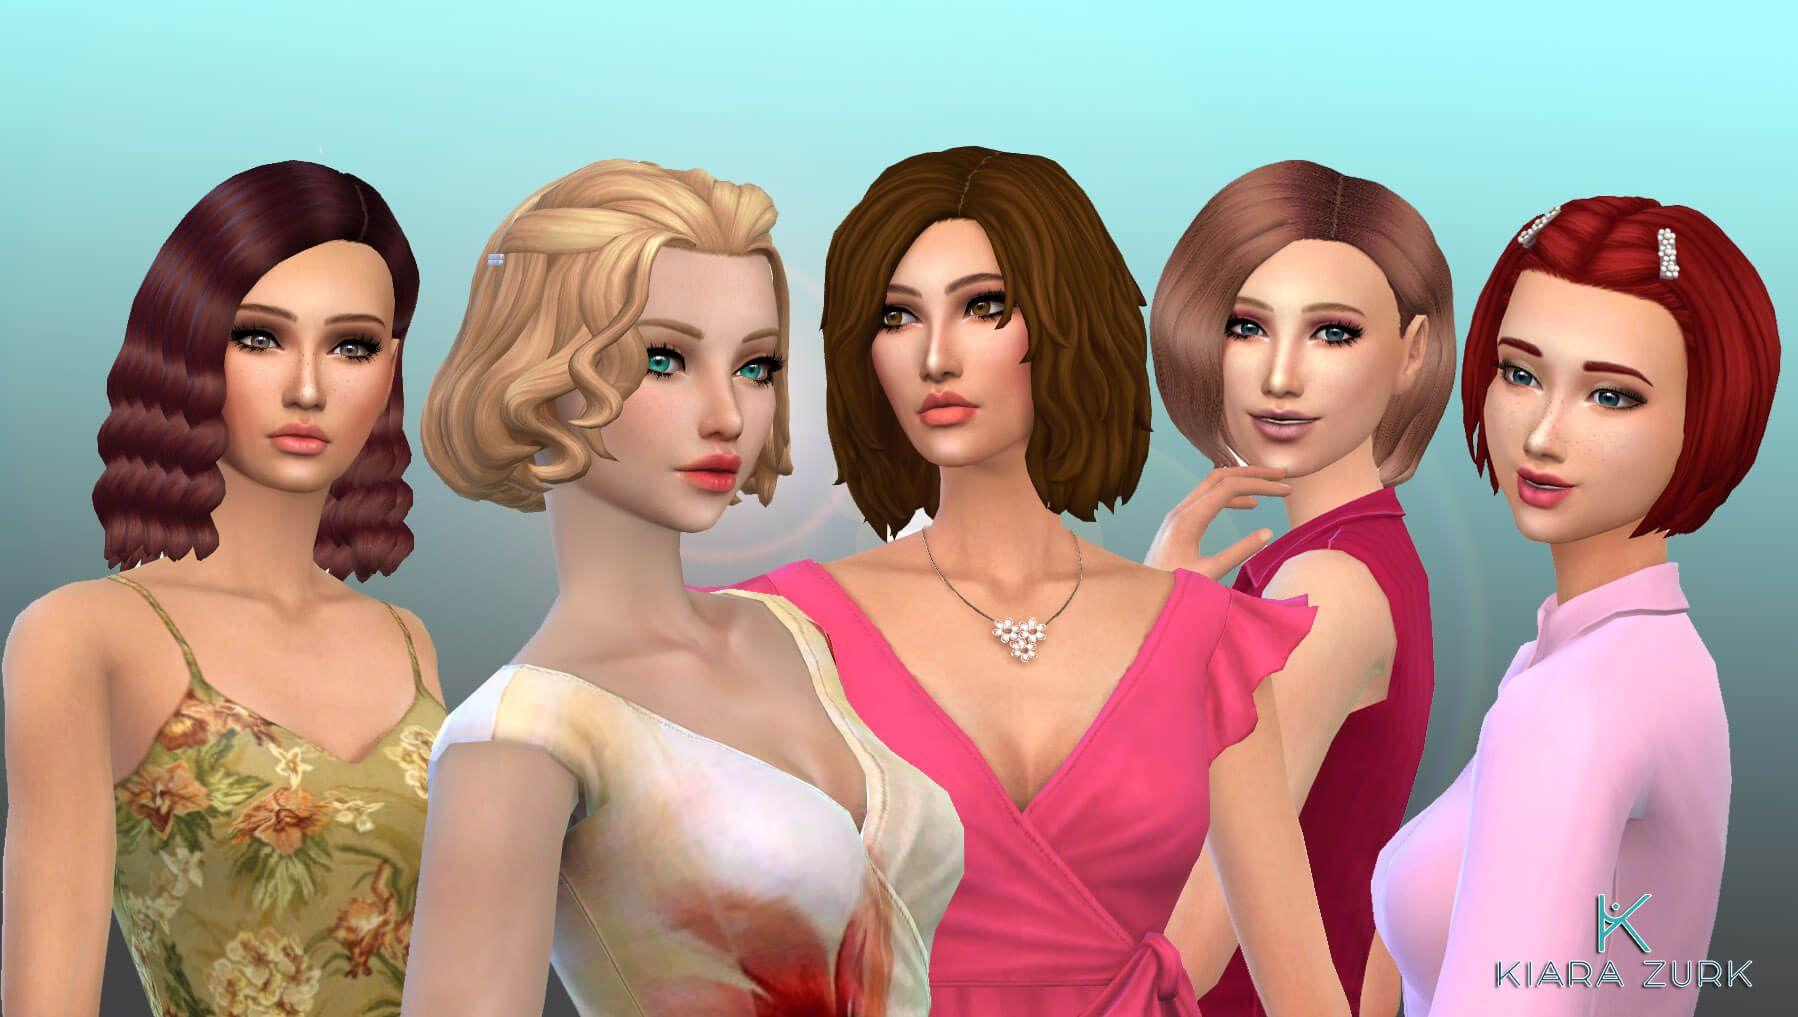 Female Medium Hair Pack 18 In 2020 Medium Hair Styles Hair Pack Womens Hairstyles